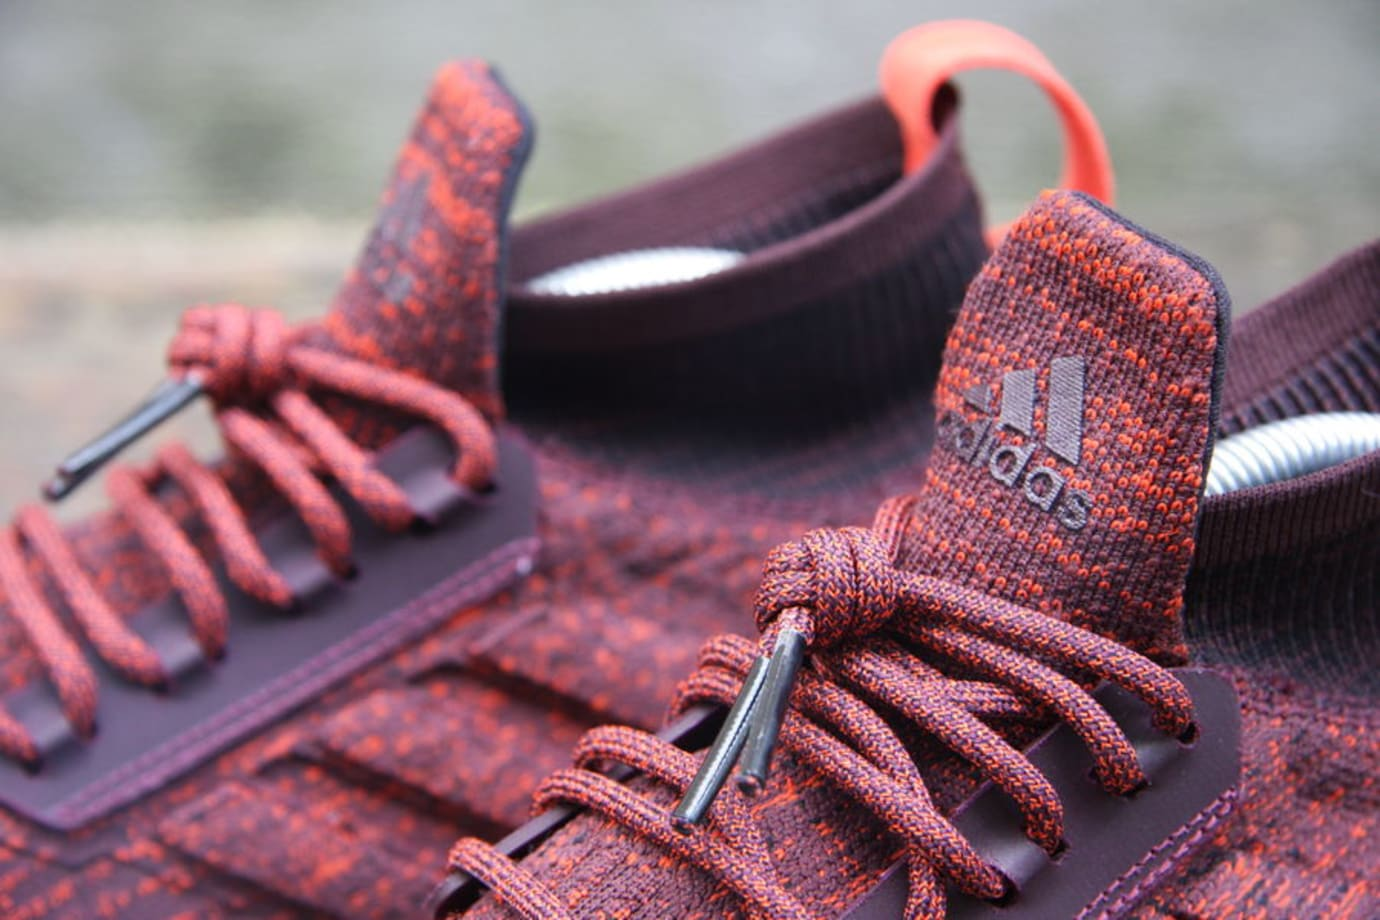 637e83744b7e9 Adidas Ultra Boost ATR Red Release Date S82035 Tongue